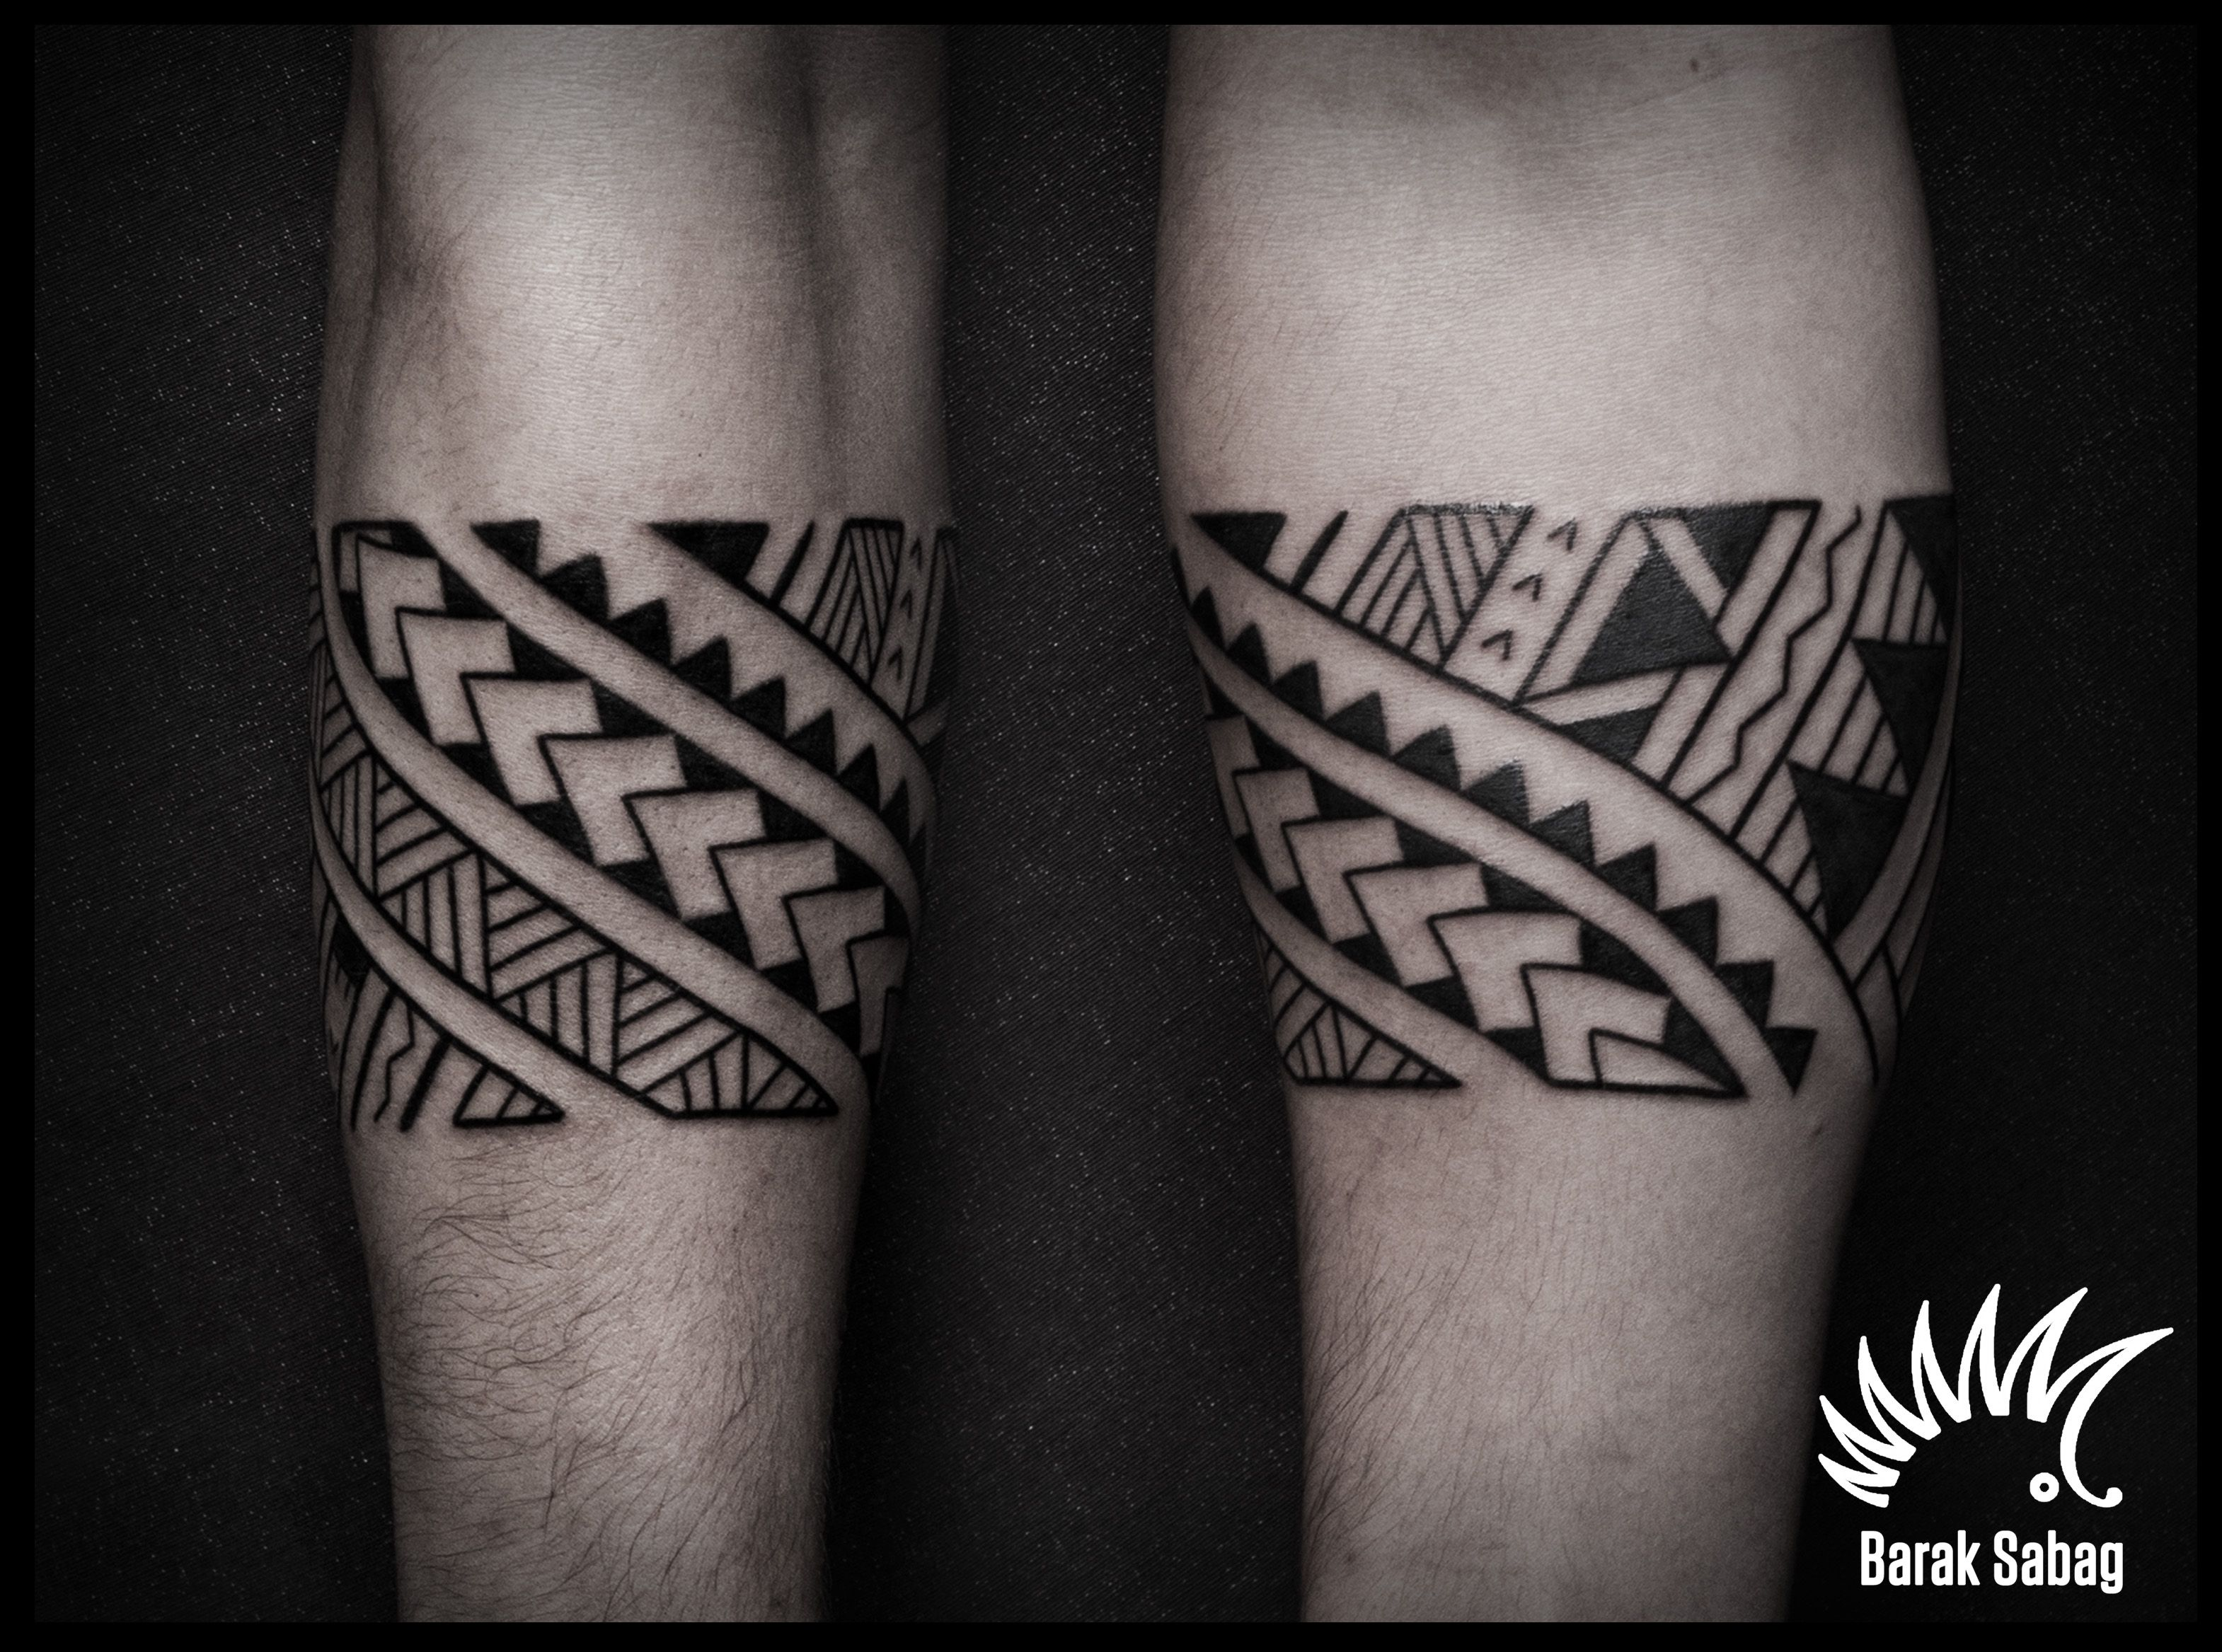 polynesian armband tattoo by barak sabag kipodd tattoos pinterest tattoos arm. Black Bedroom Furniture Sets. Home Design Ideas